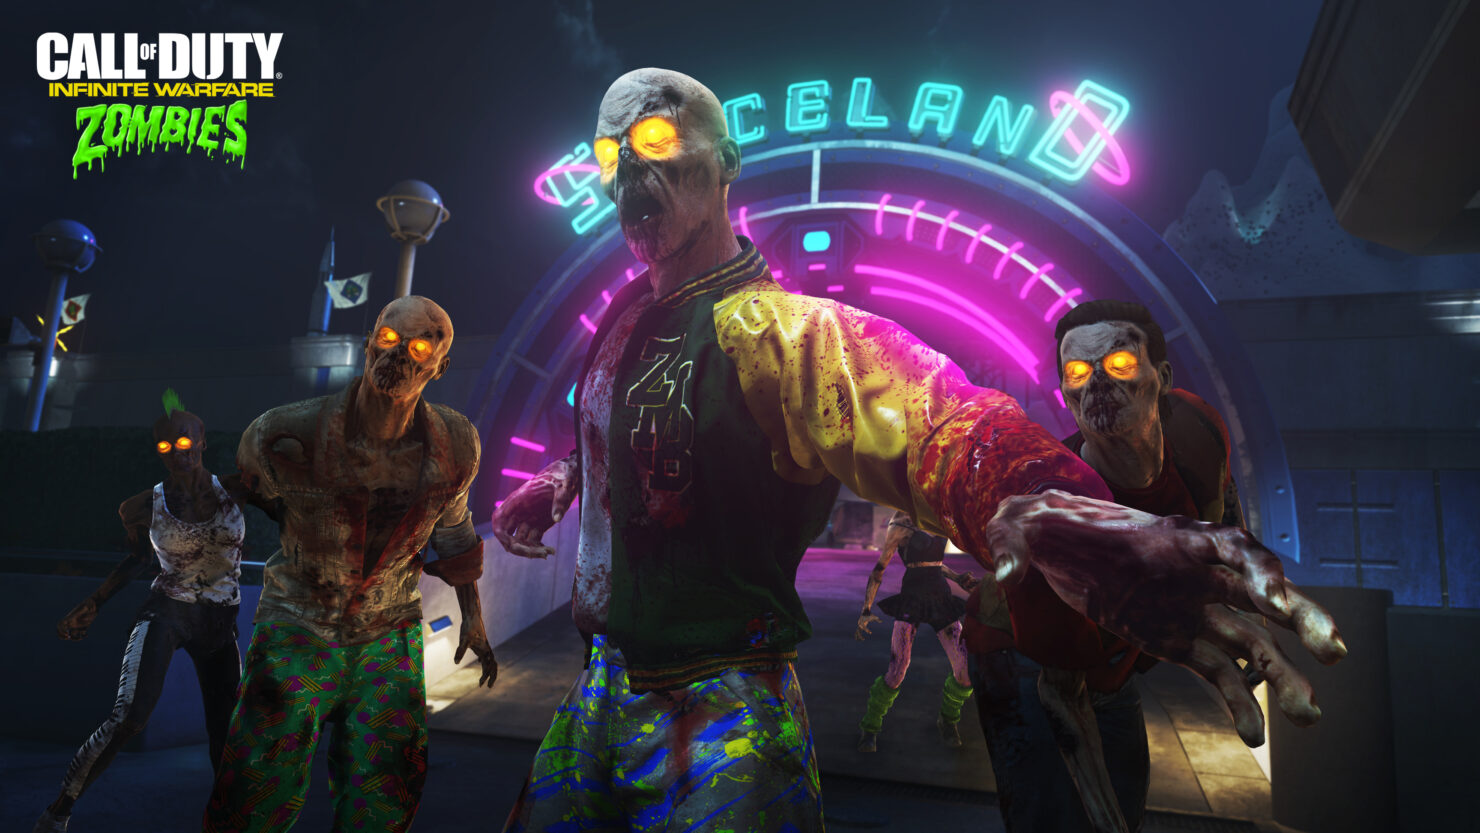 cod-infinite-warfare_zombies-in-spaceland-1_wm